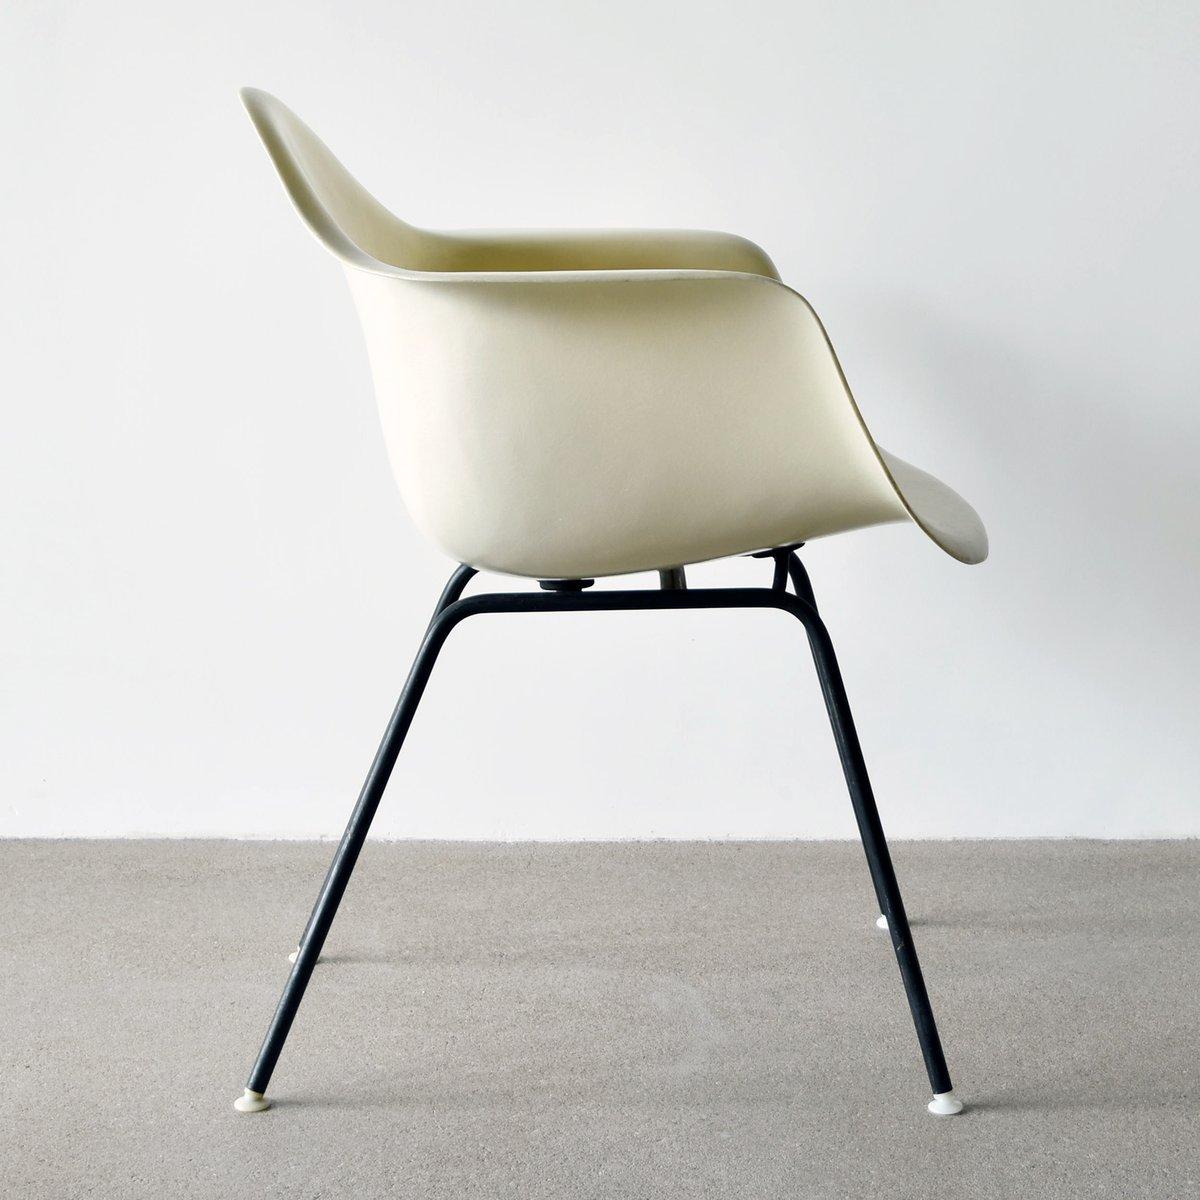 Chaise dax par charles et ray eames pour herman miller 1962 en vente sur pamono - Charles et ray eames chaise ...